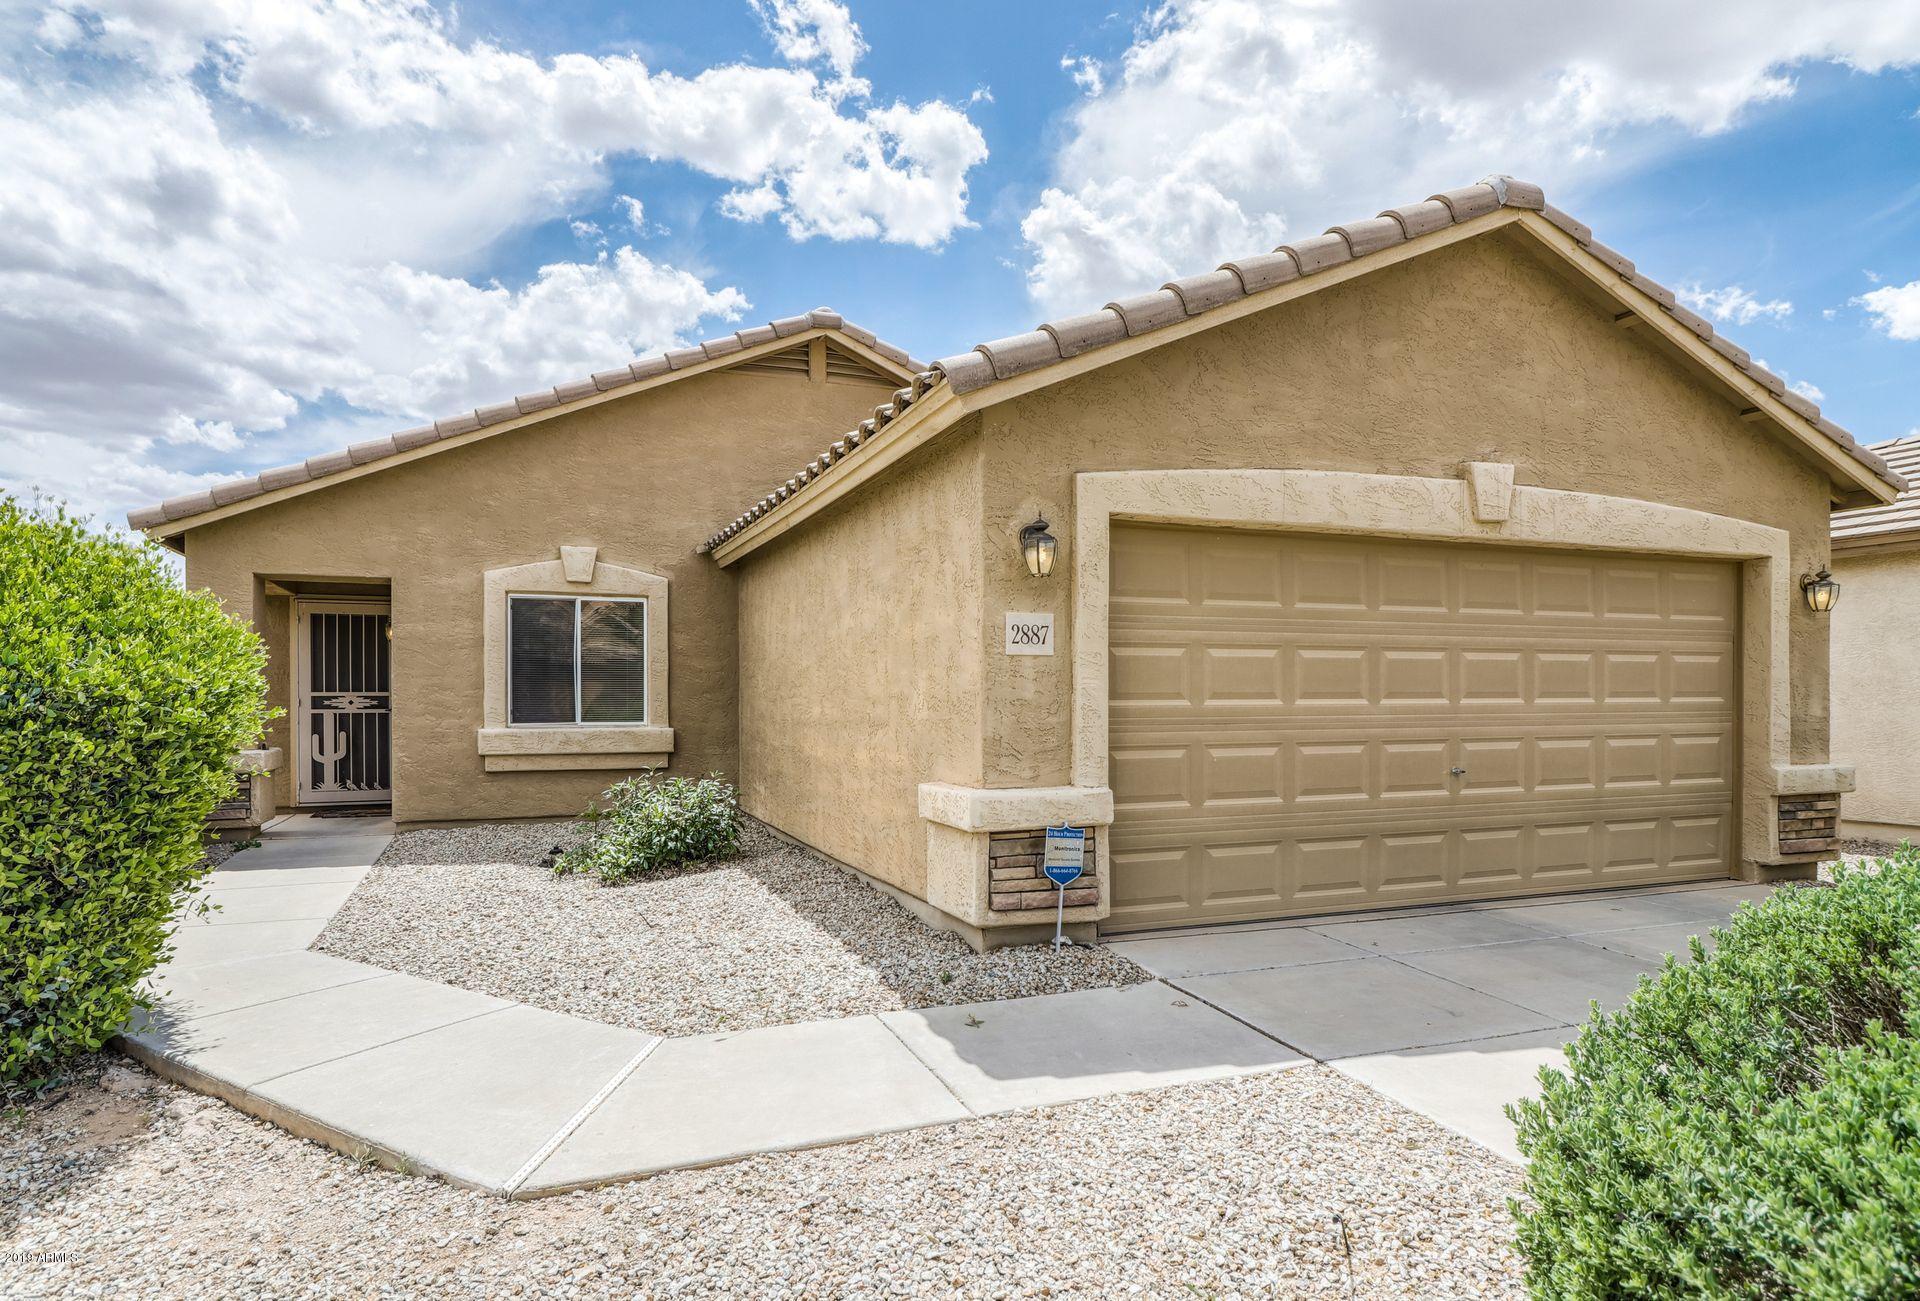 Photo of 2887 E OLIVINE Road, San Tan Valley, AZ 85143